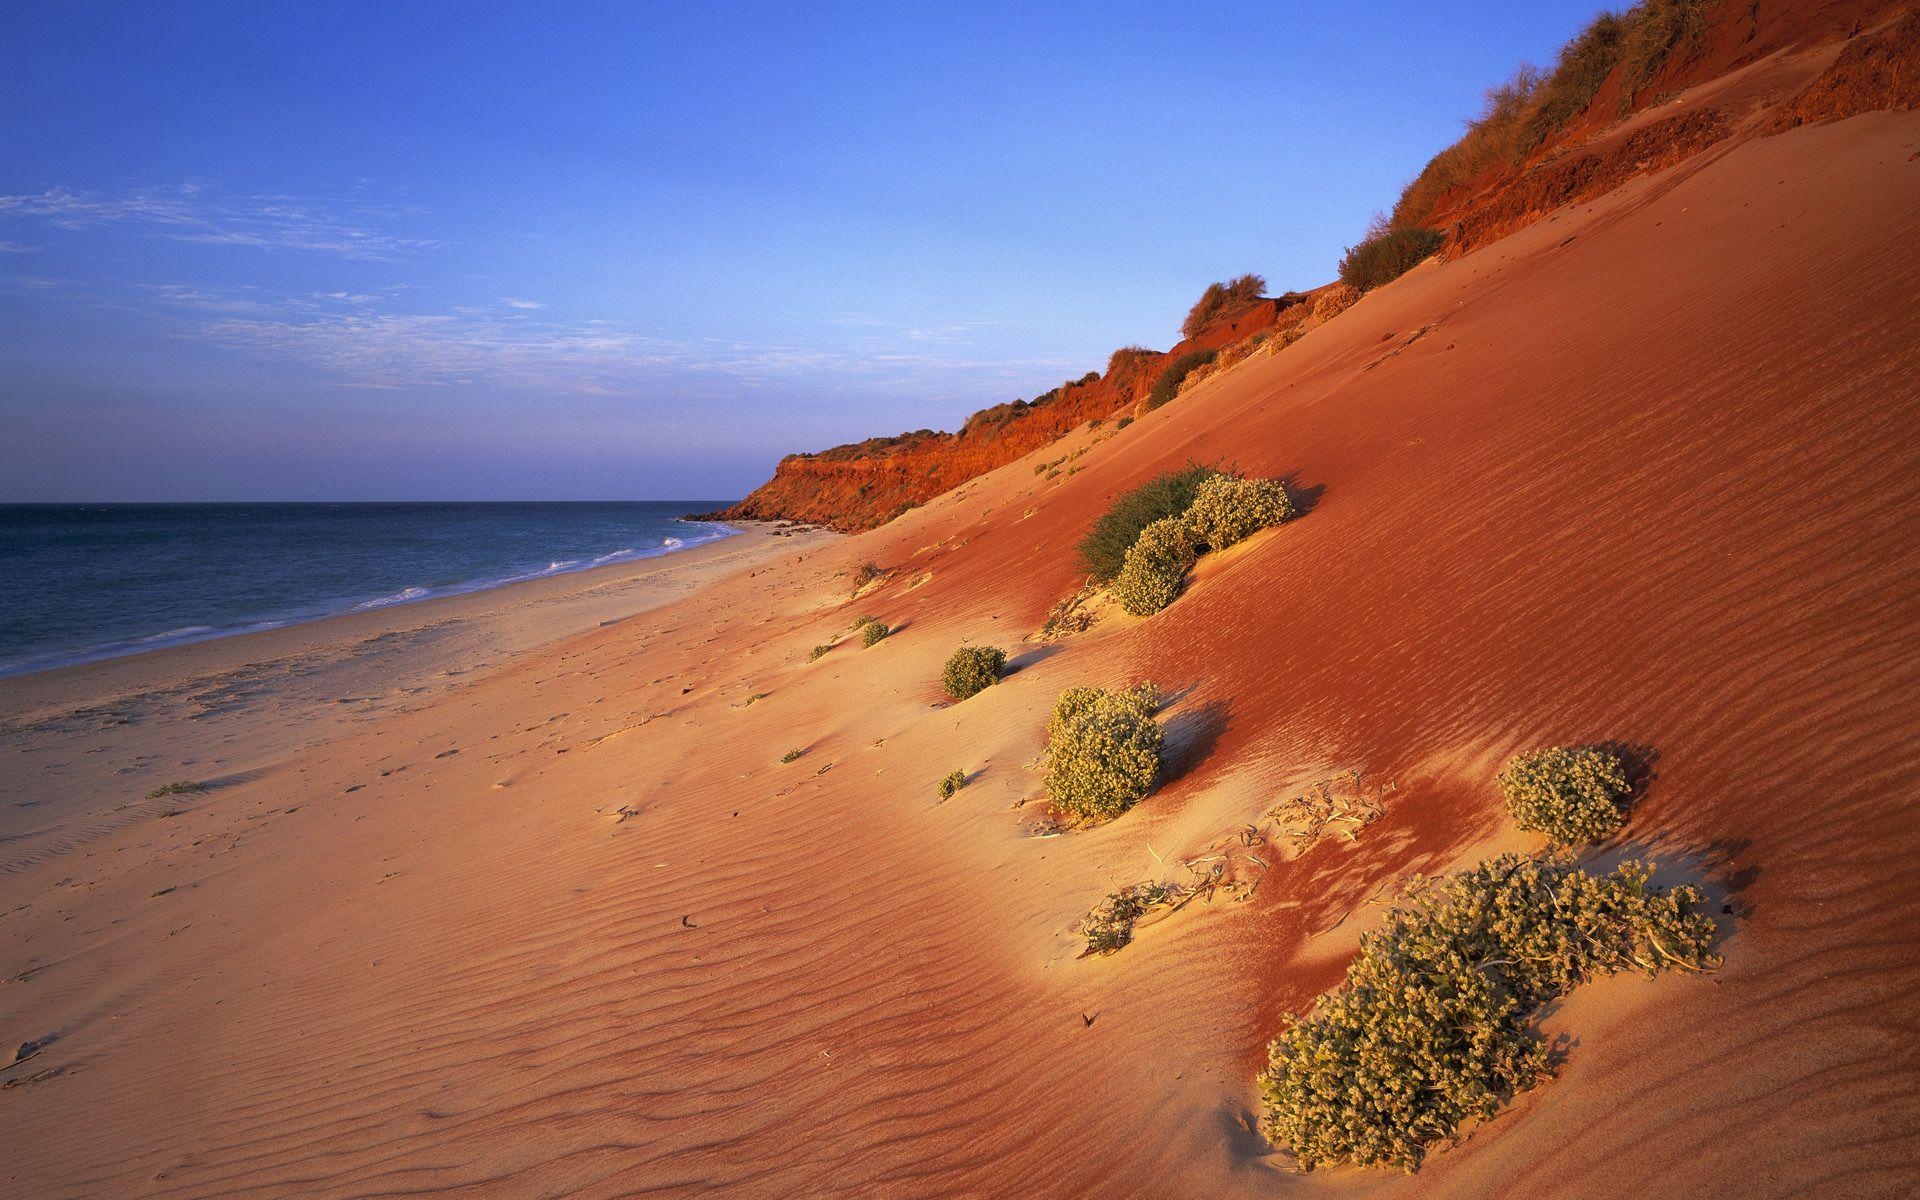 Dune Quote Wallpaper Australian Coast Desert Ocean Red Sand Sea Hd Wallpaper